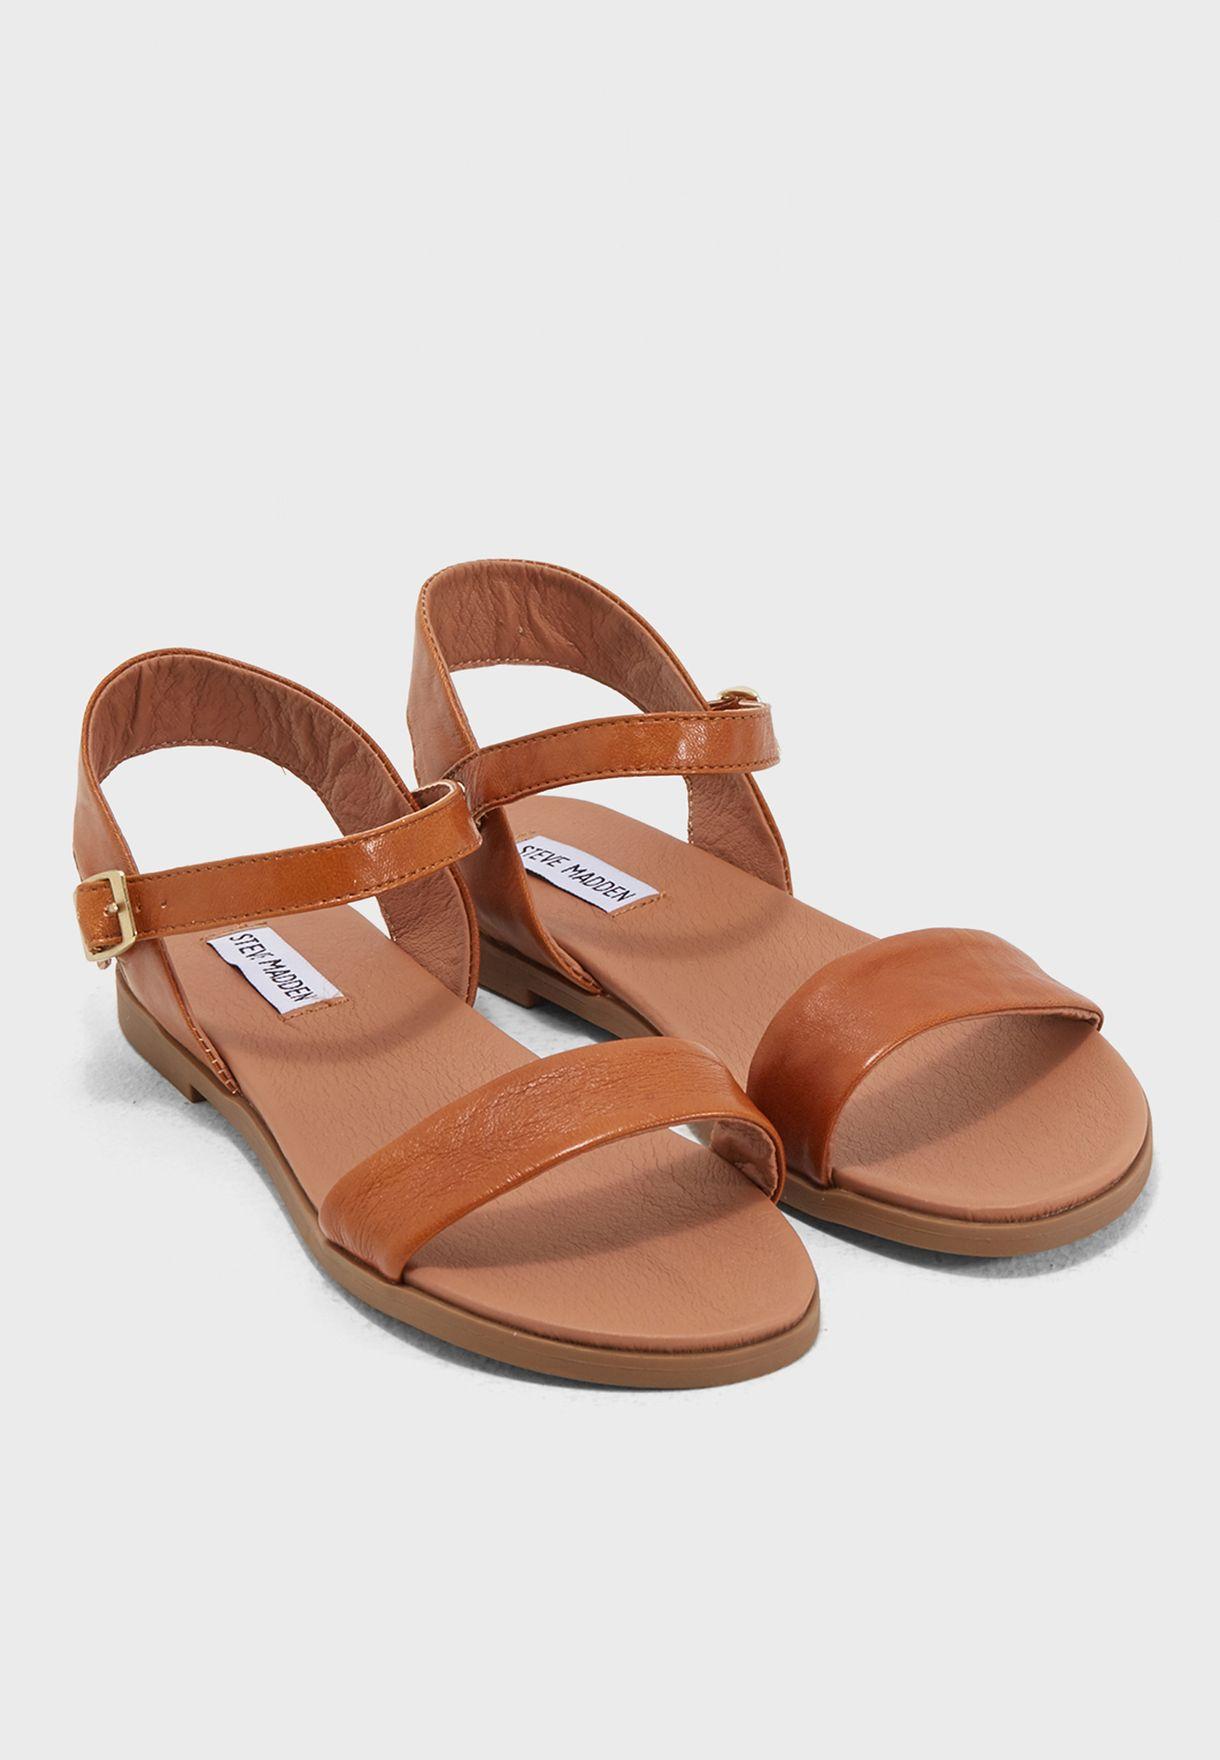 244ce4c0a519 Shop Steve Madden browns Dina Flat Sandals DINA for Women in UAE ...